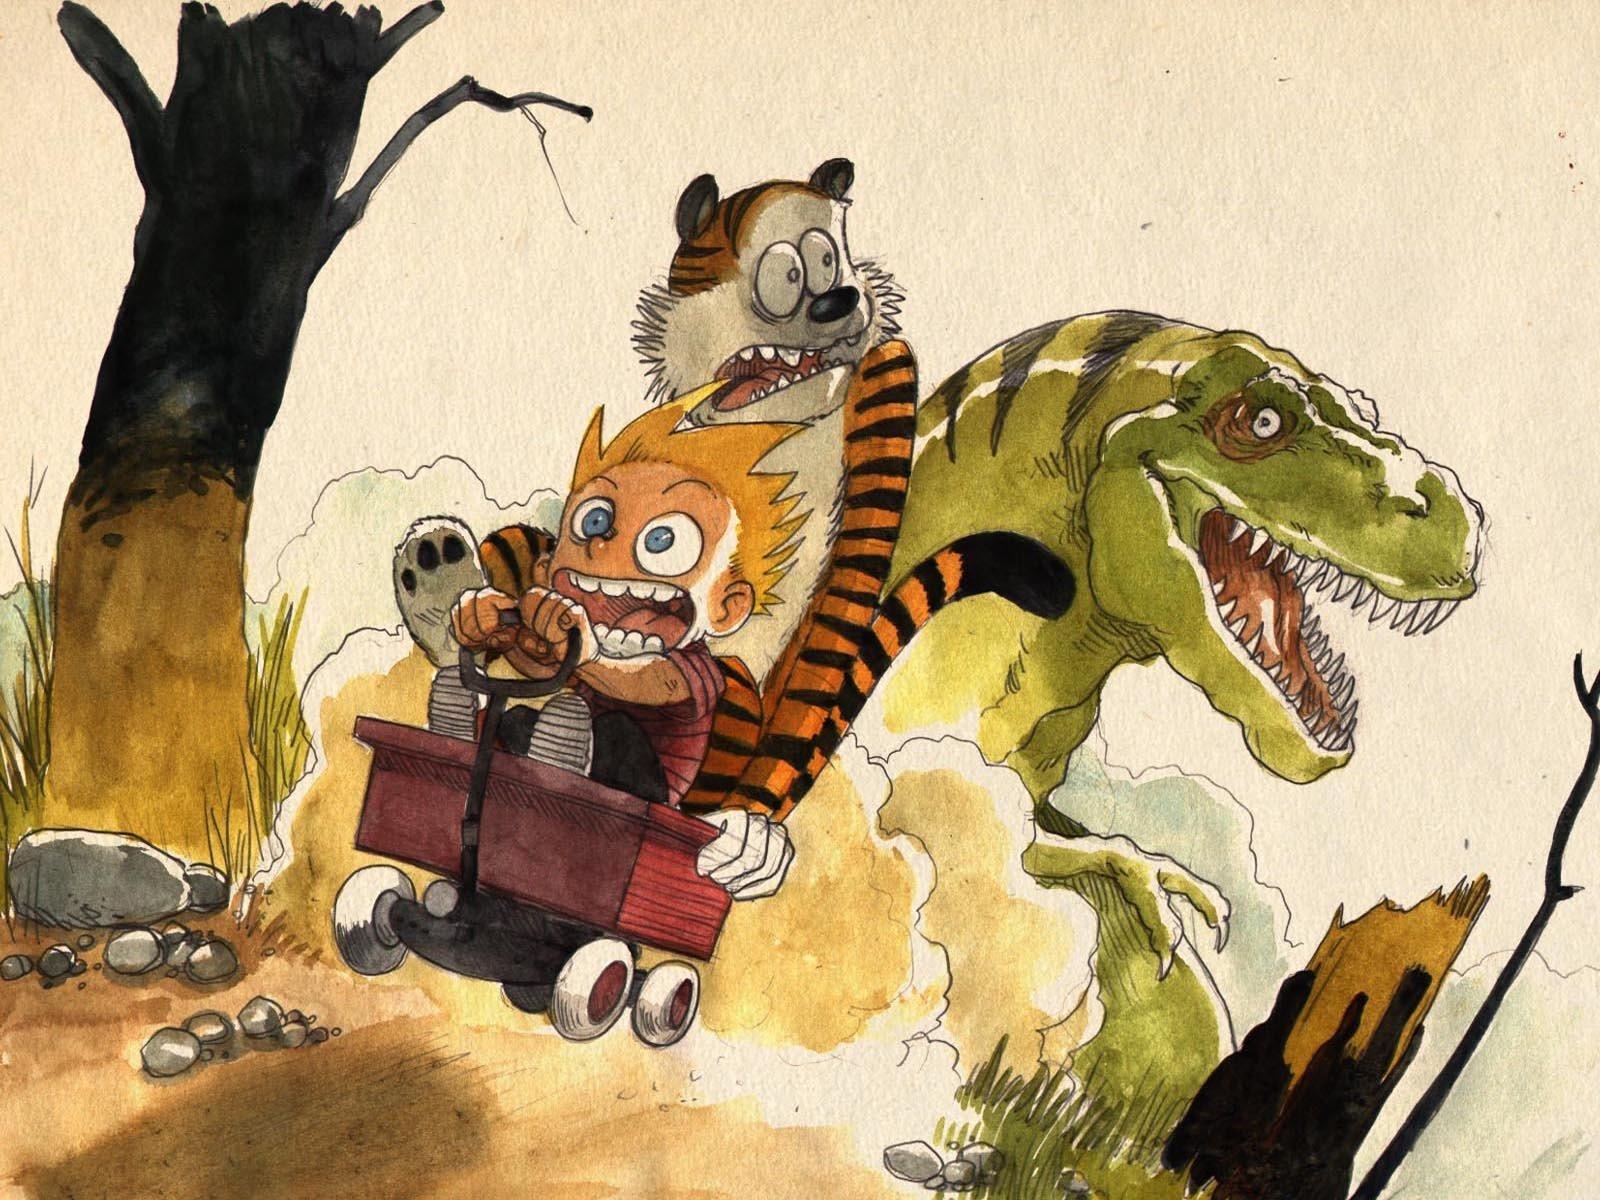 Wallpaper : 1600x1200 px, Calvin and Hobbes, Tyrannosaurus rex ...